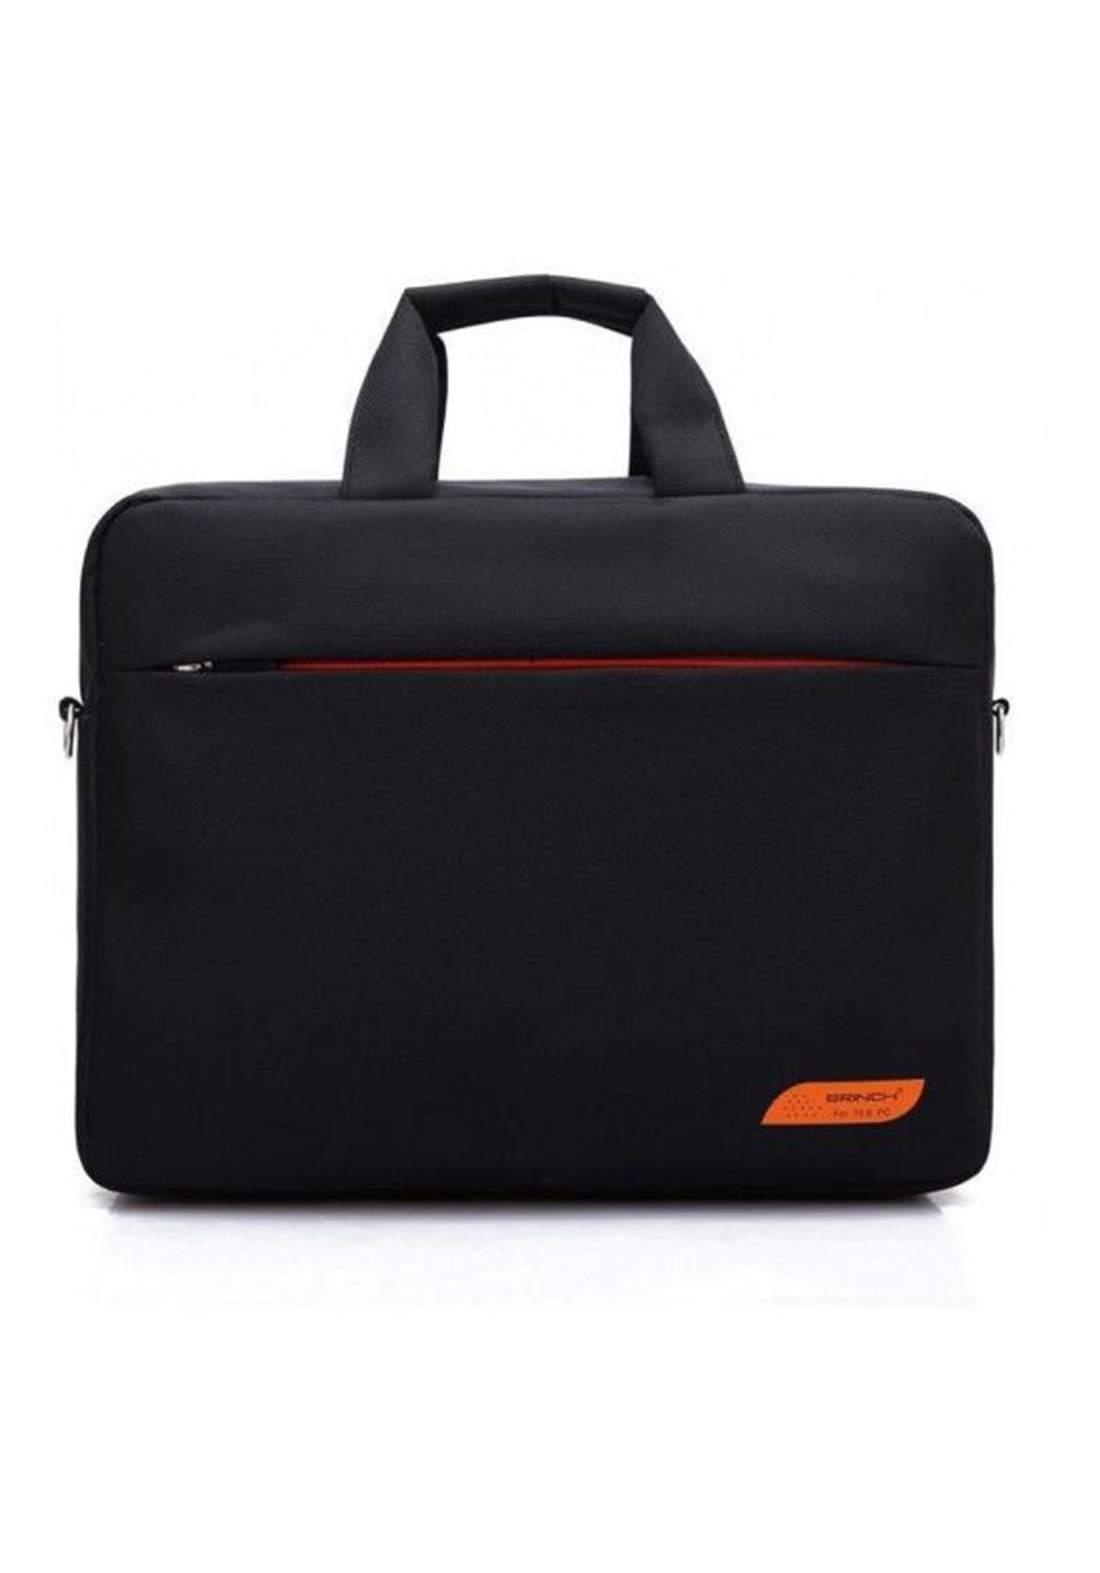 "SS-206   15.6"" Laptop Bag - Black   حقيبة لابتوب"